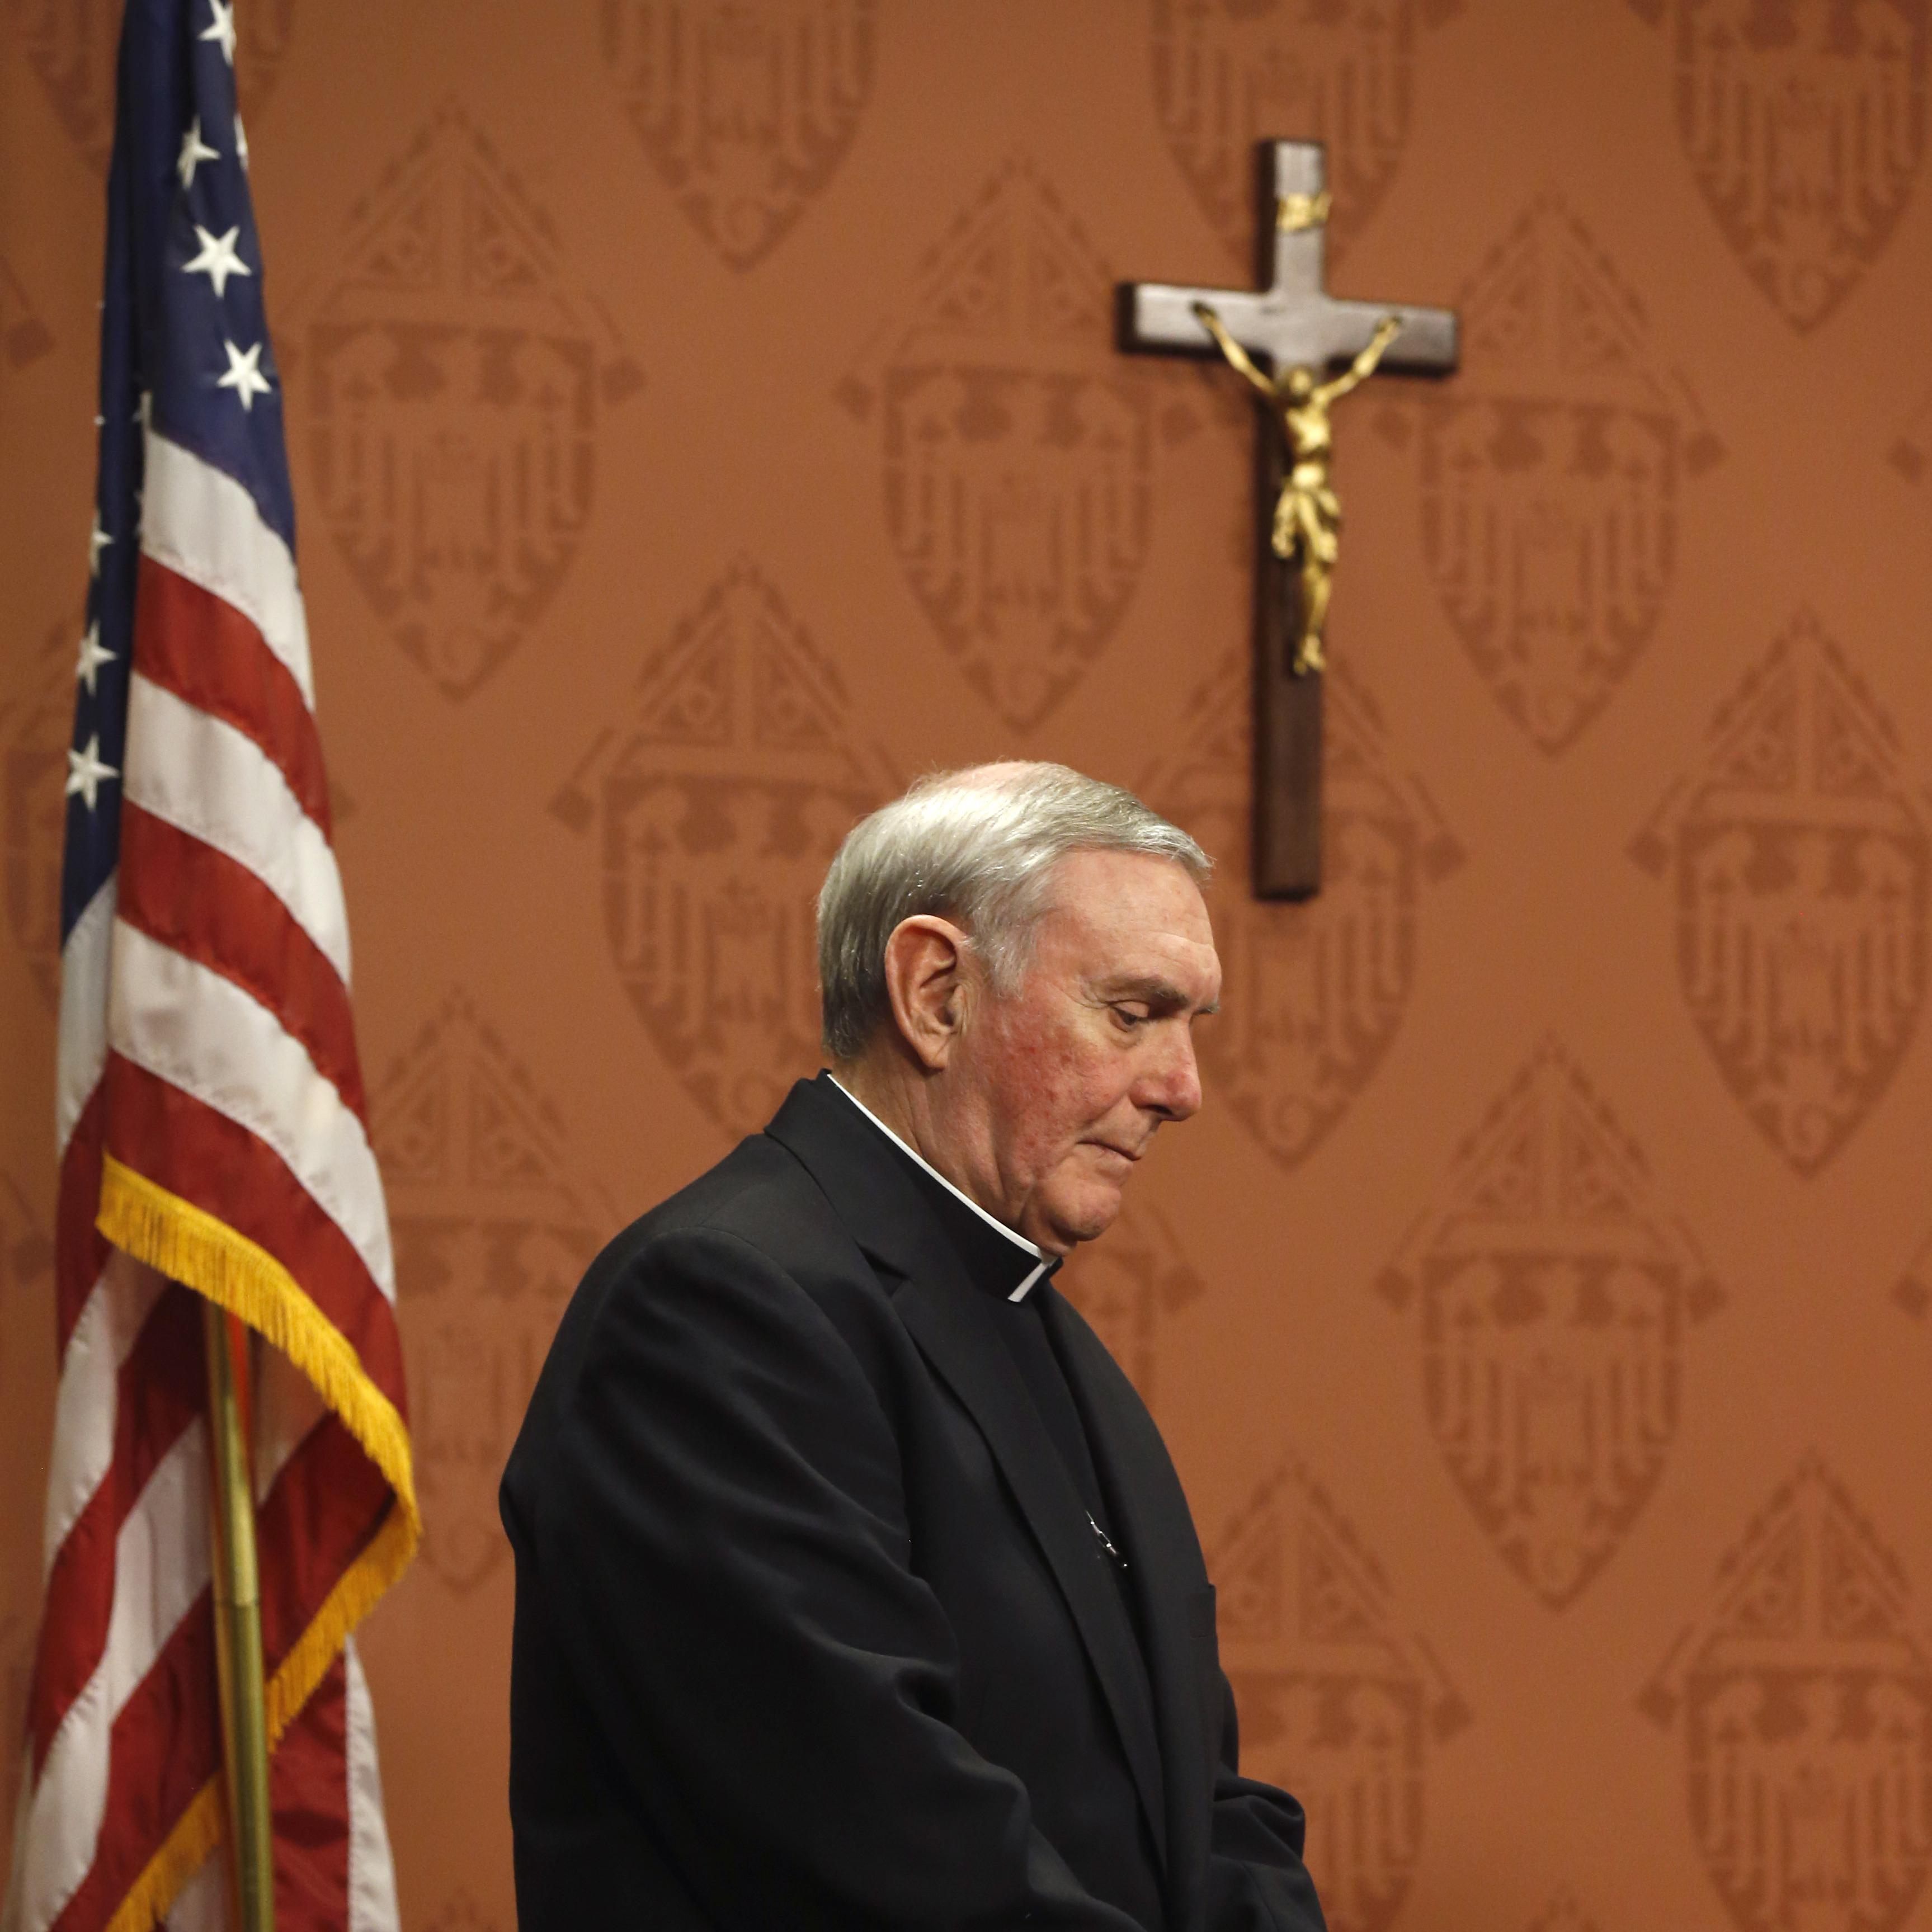 Vatican Comes Under U.N. Scrutiny Over Priest Abuse Scandal